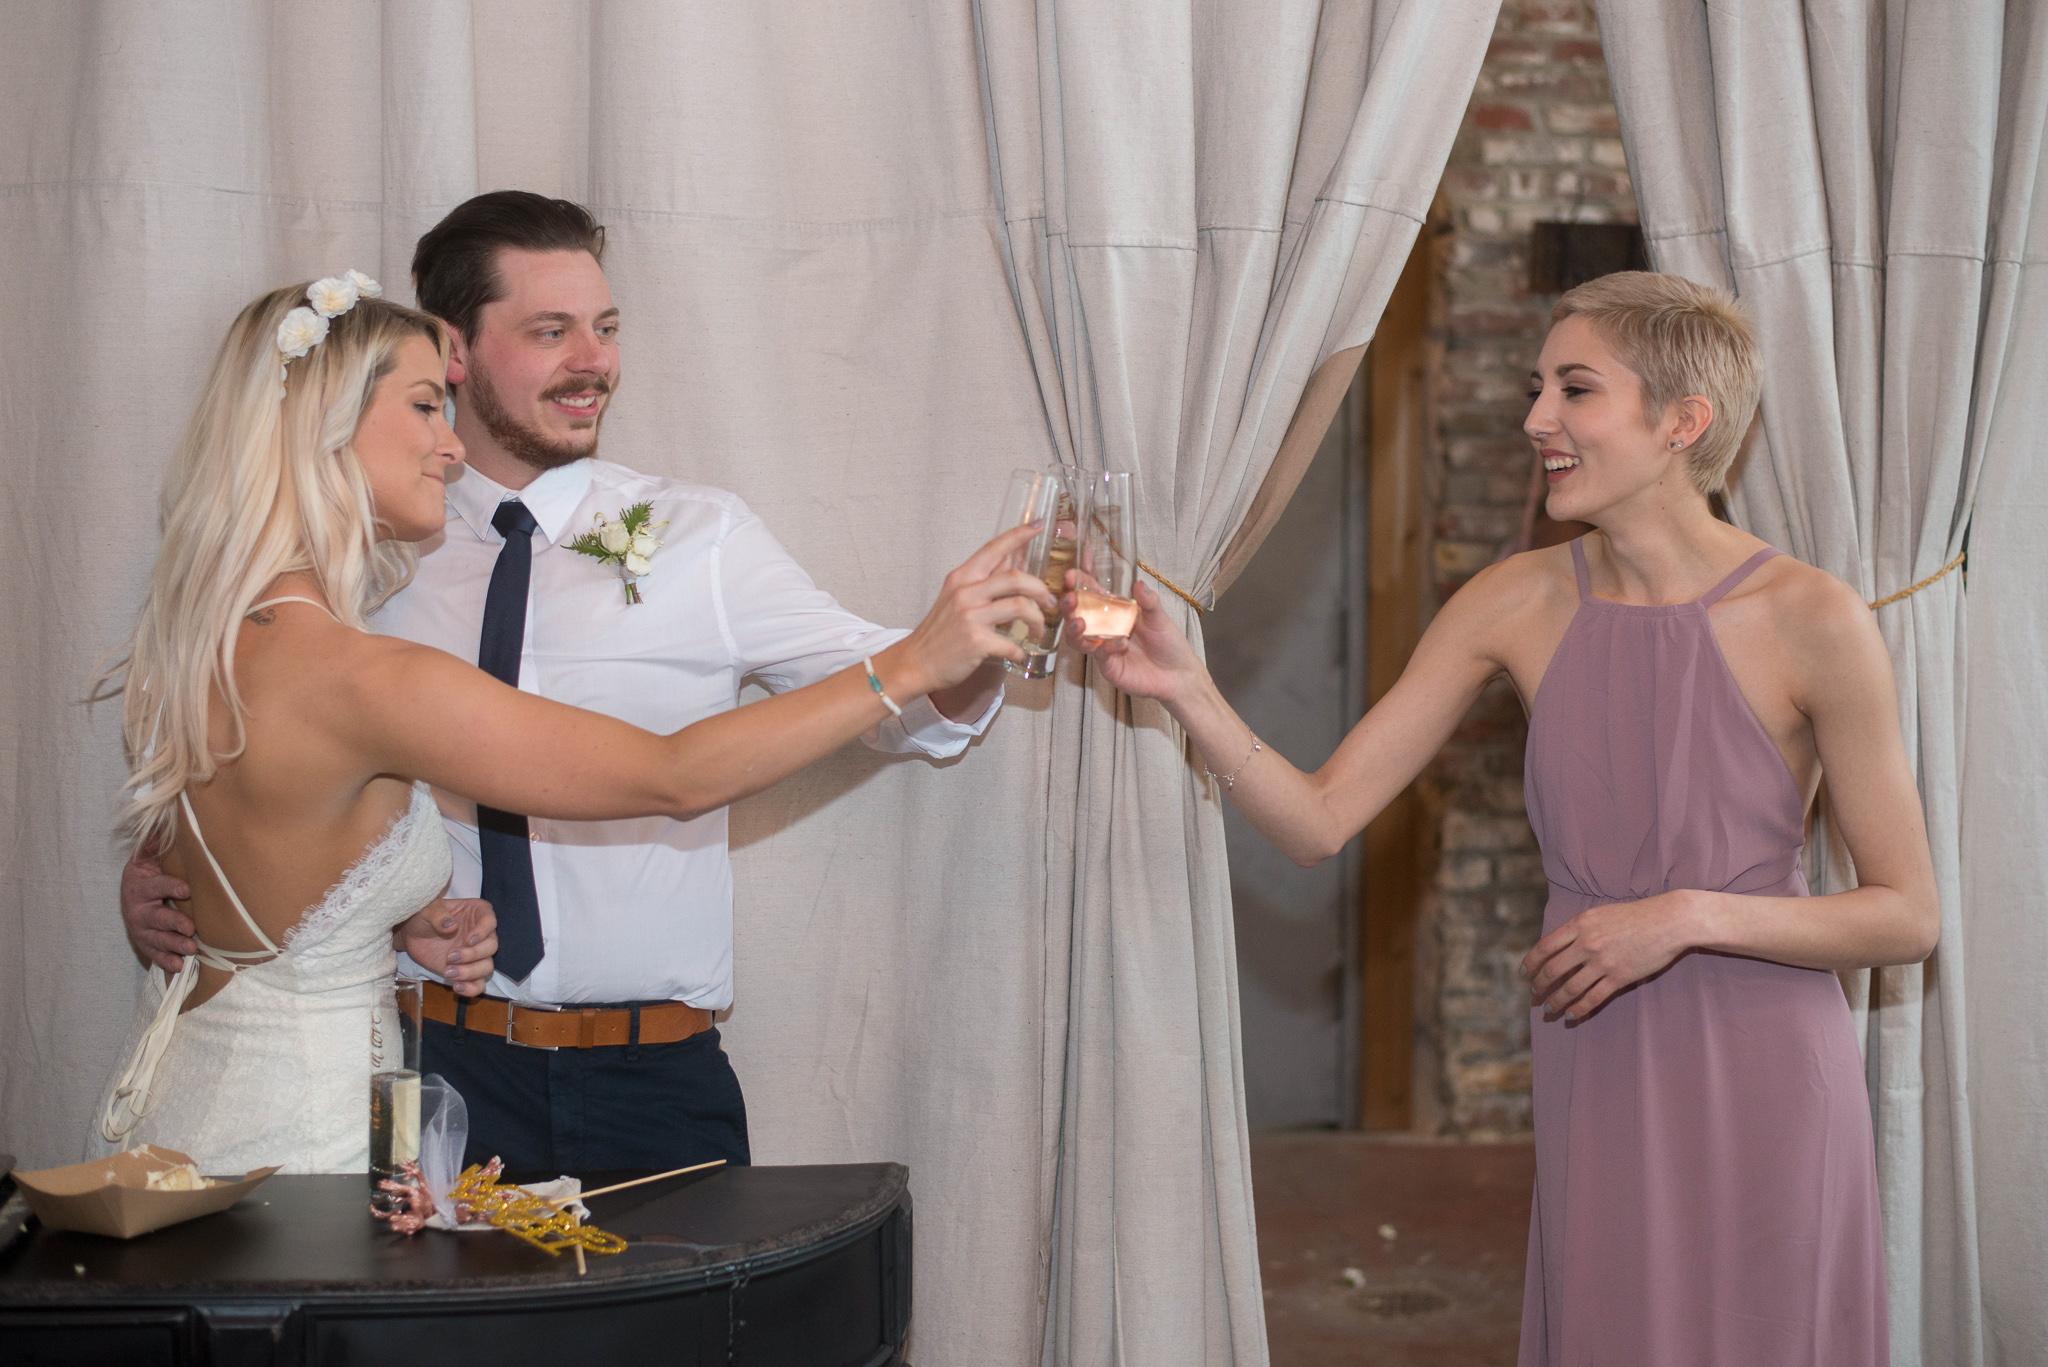 Wedding_Day_Moments_To_Do_List_Dalton&Lauren_275.jpg